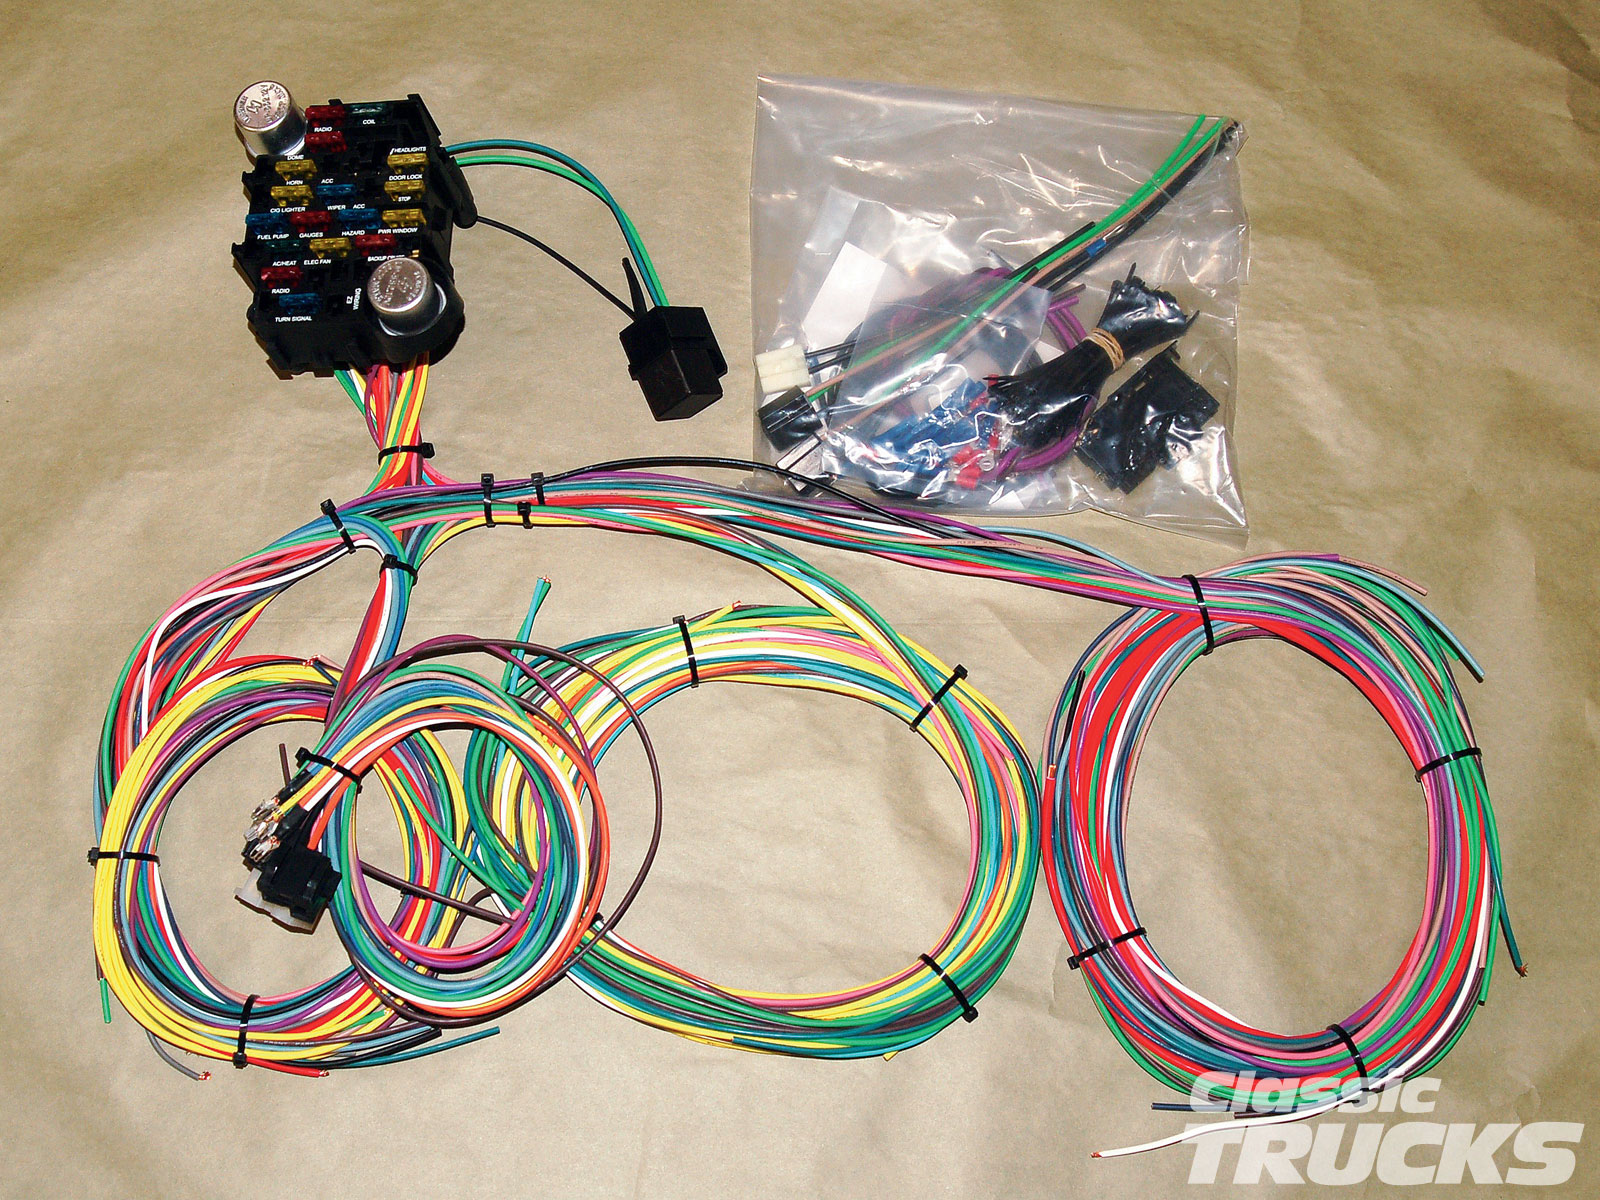 small resolution of jd 2520 wiring diagram wiring diagram john deere 2520 wiring harness